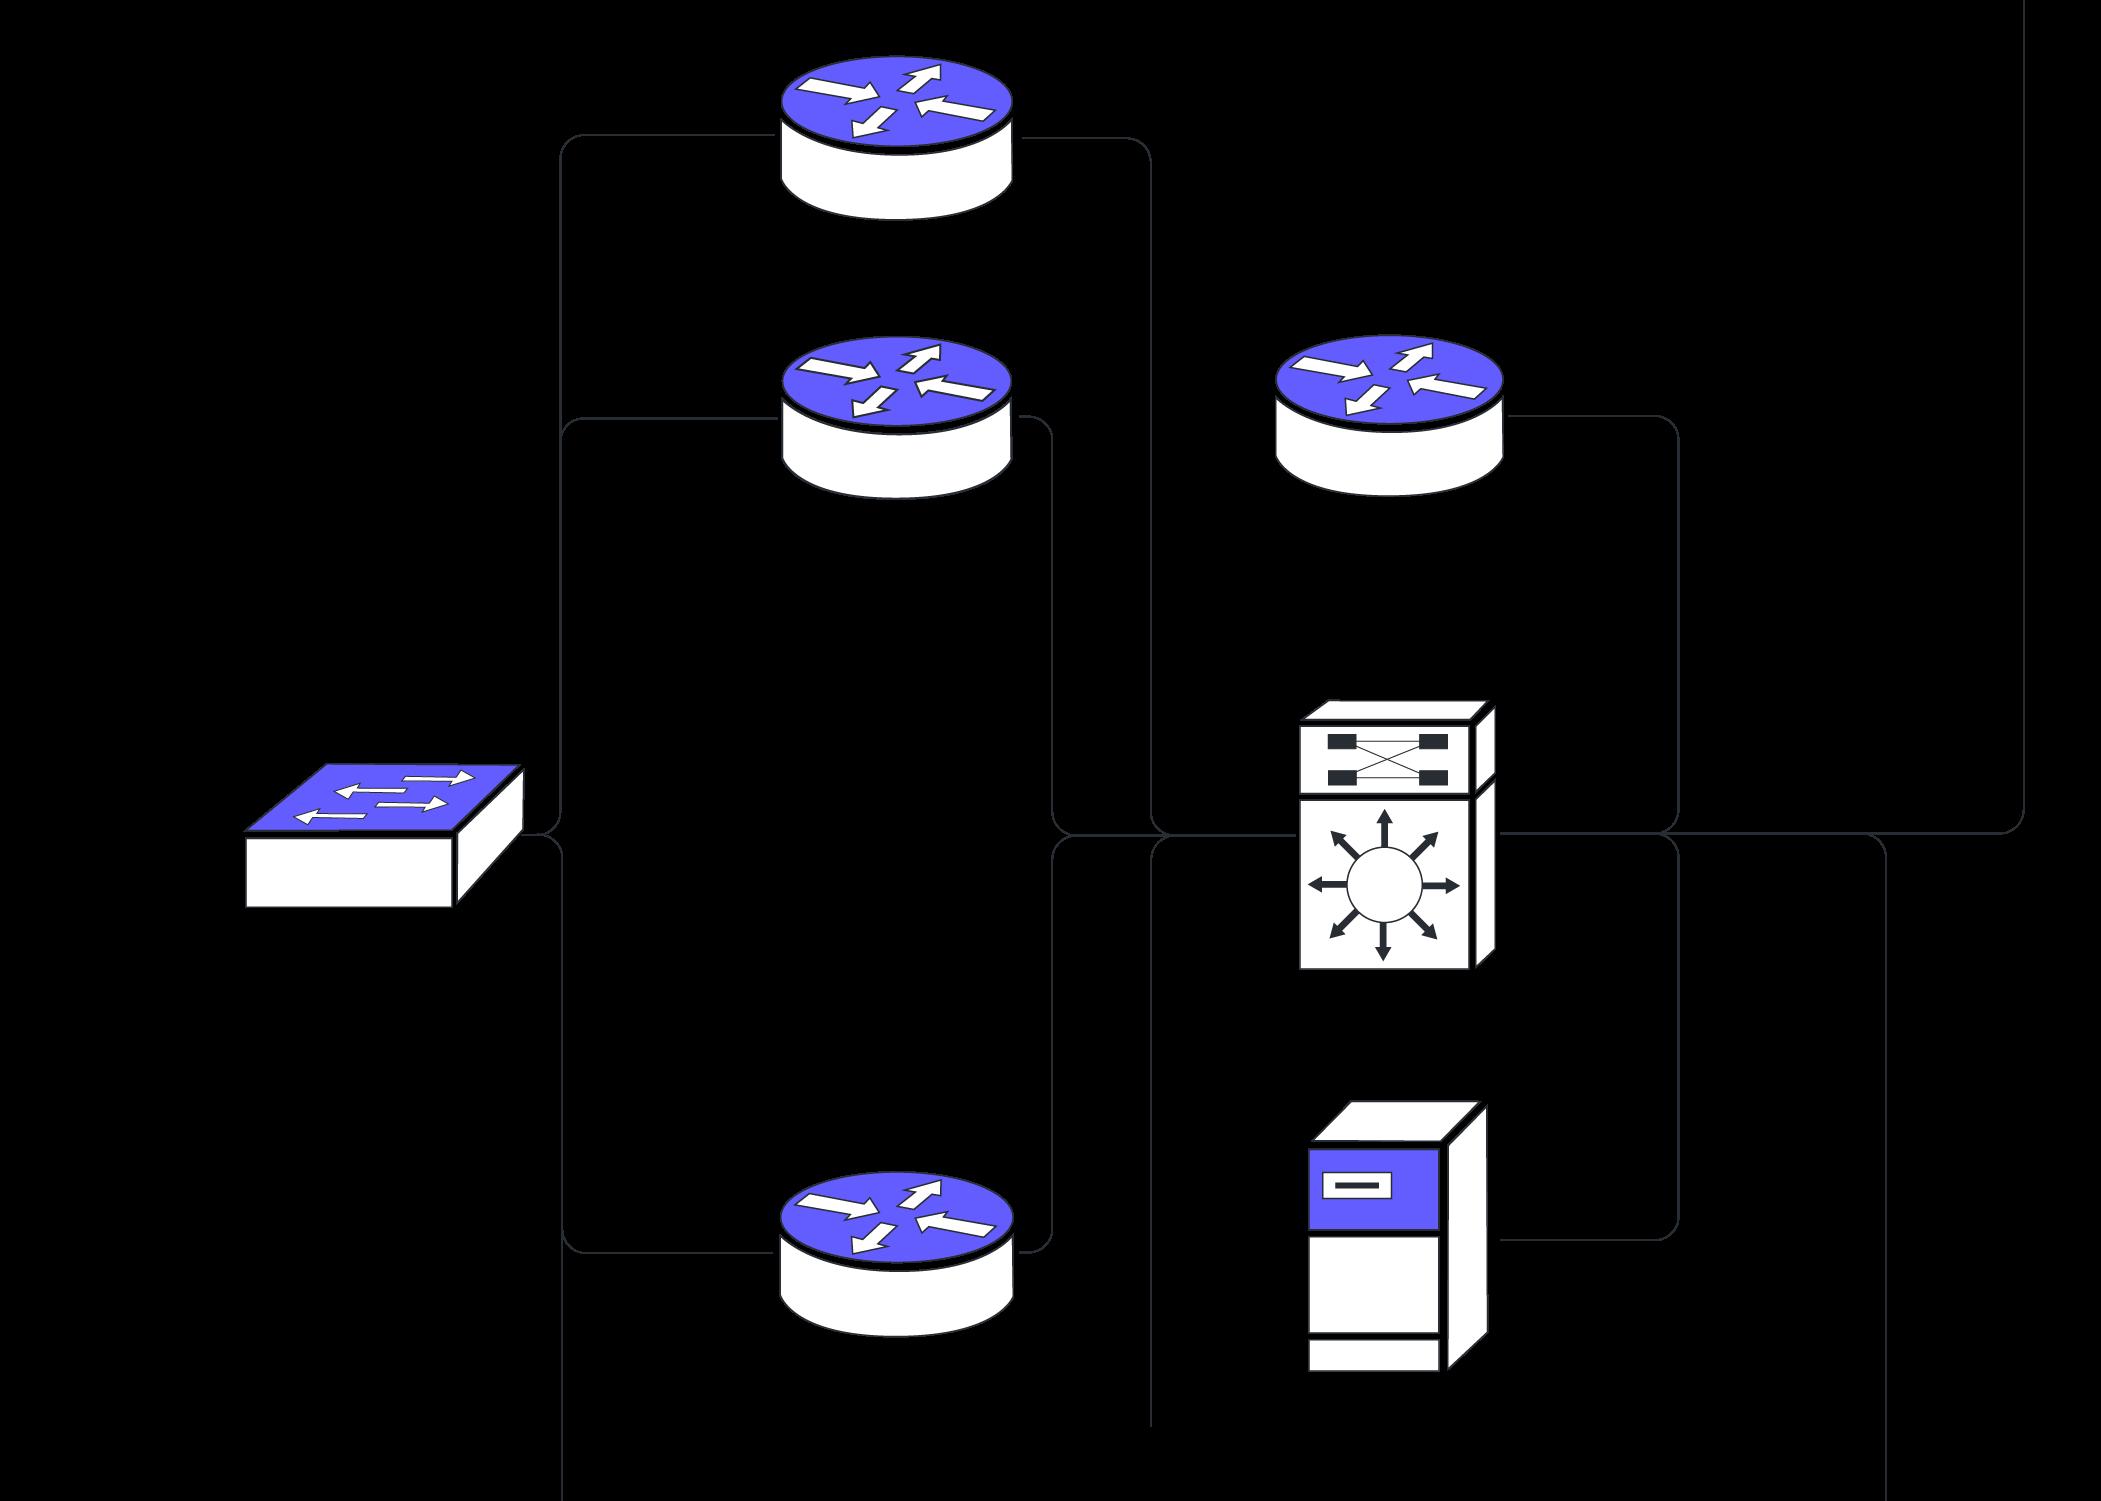 azure(アジュール) クラウドコンピューティング構成図の作成ツール